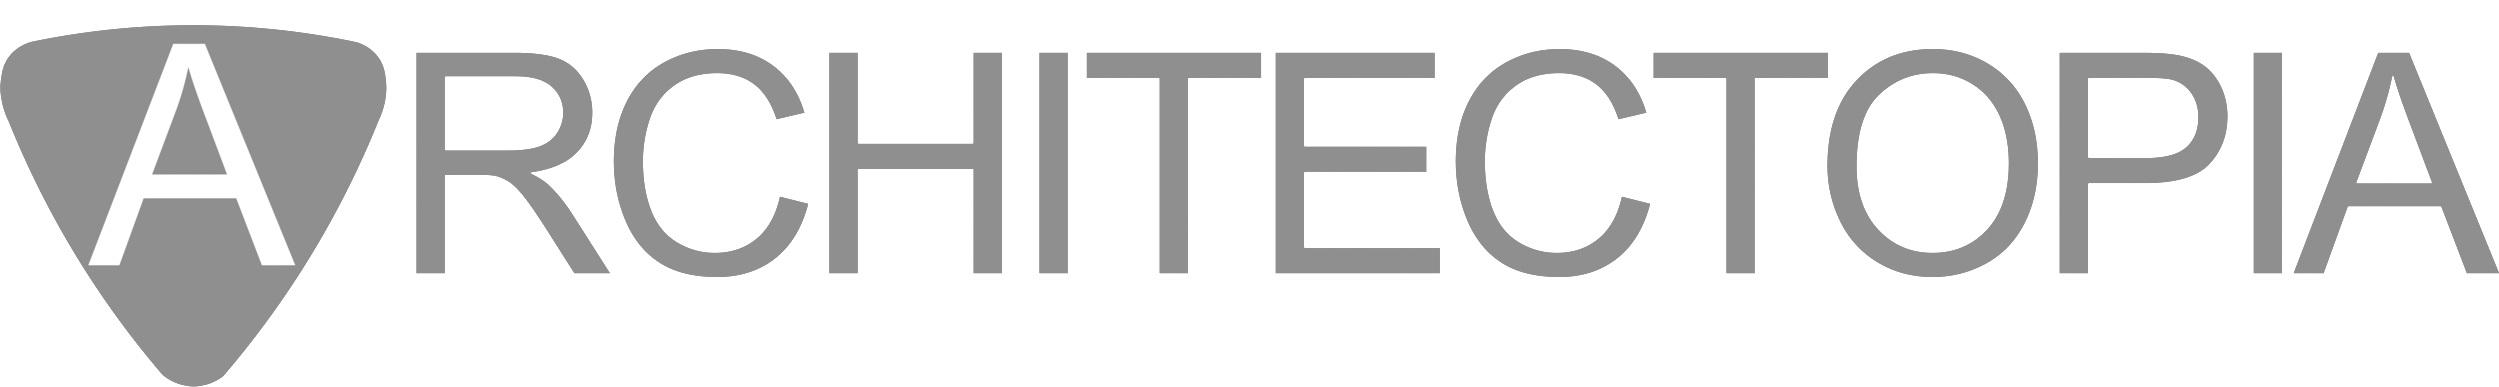 190129_Full logo-grey.png